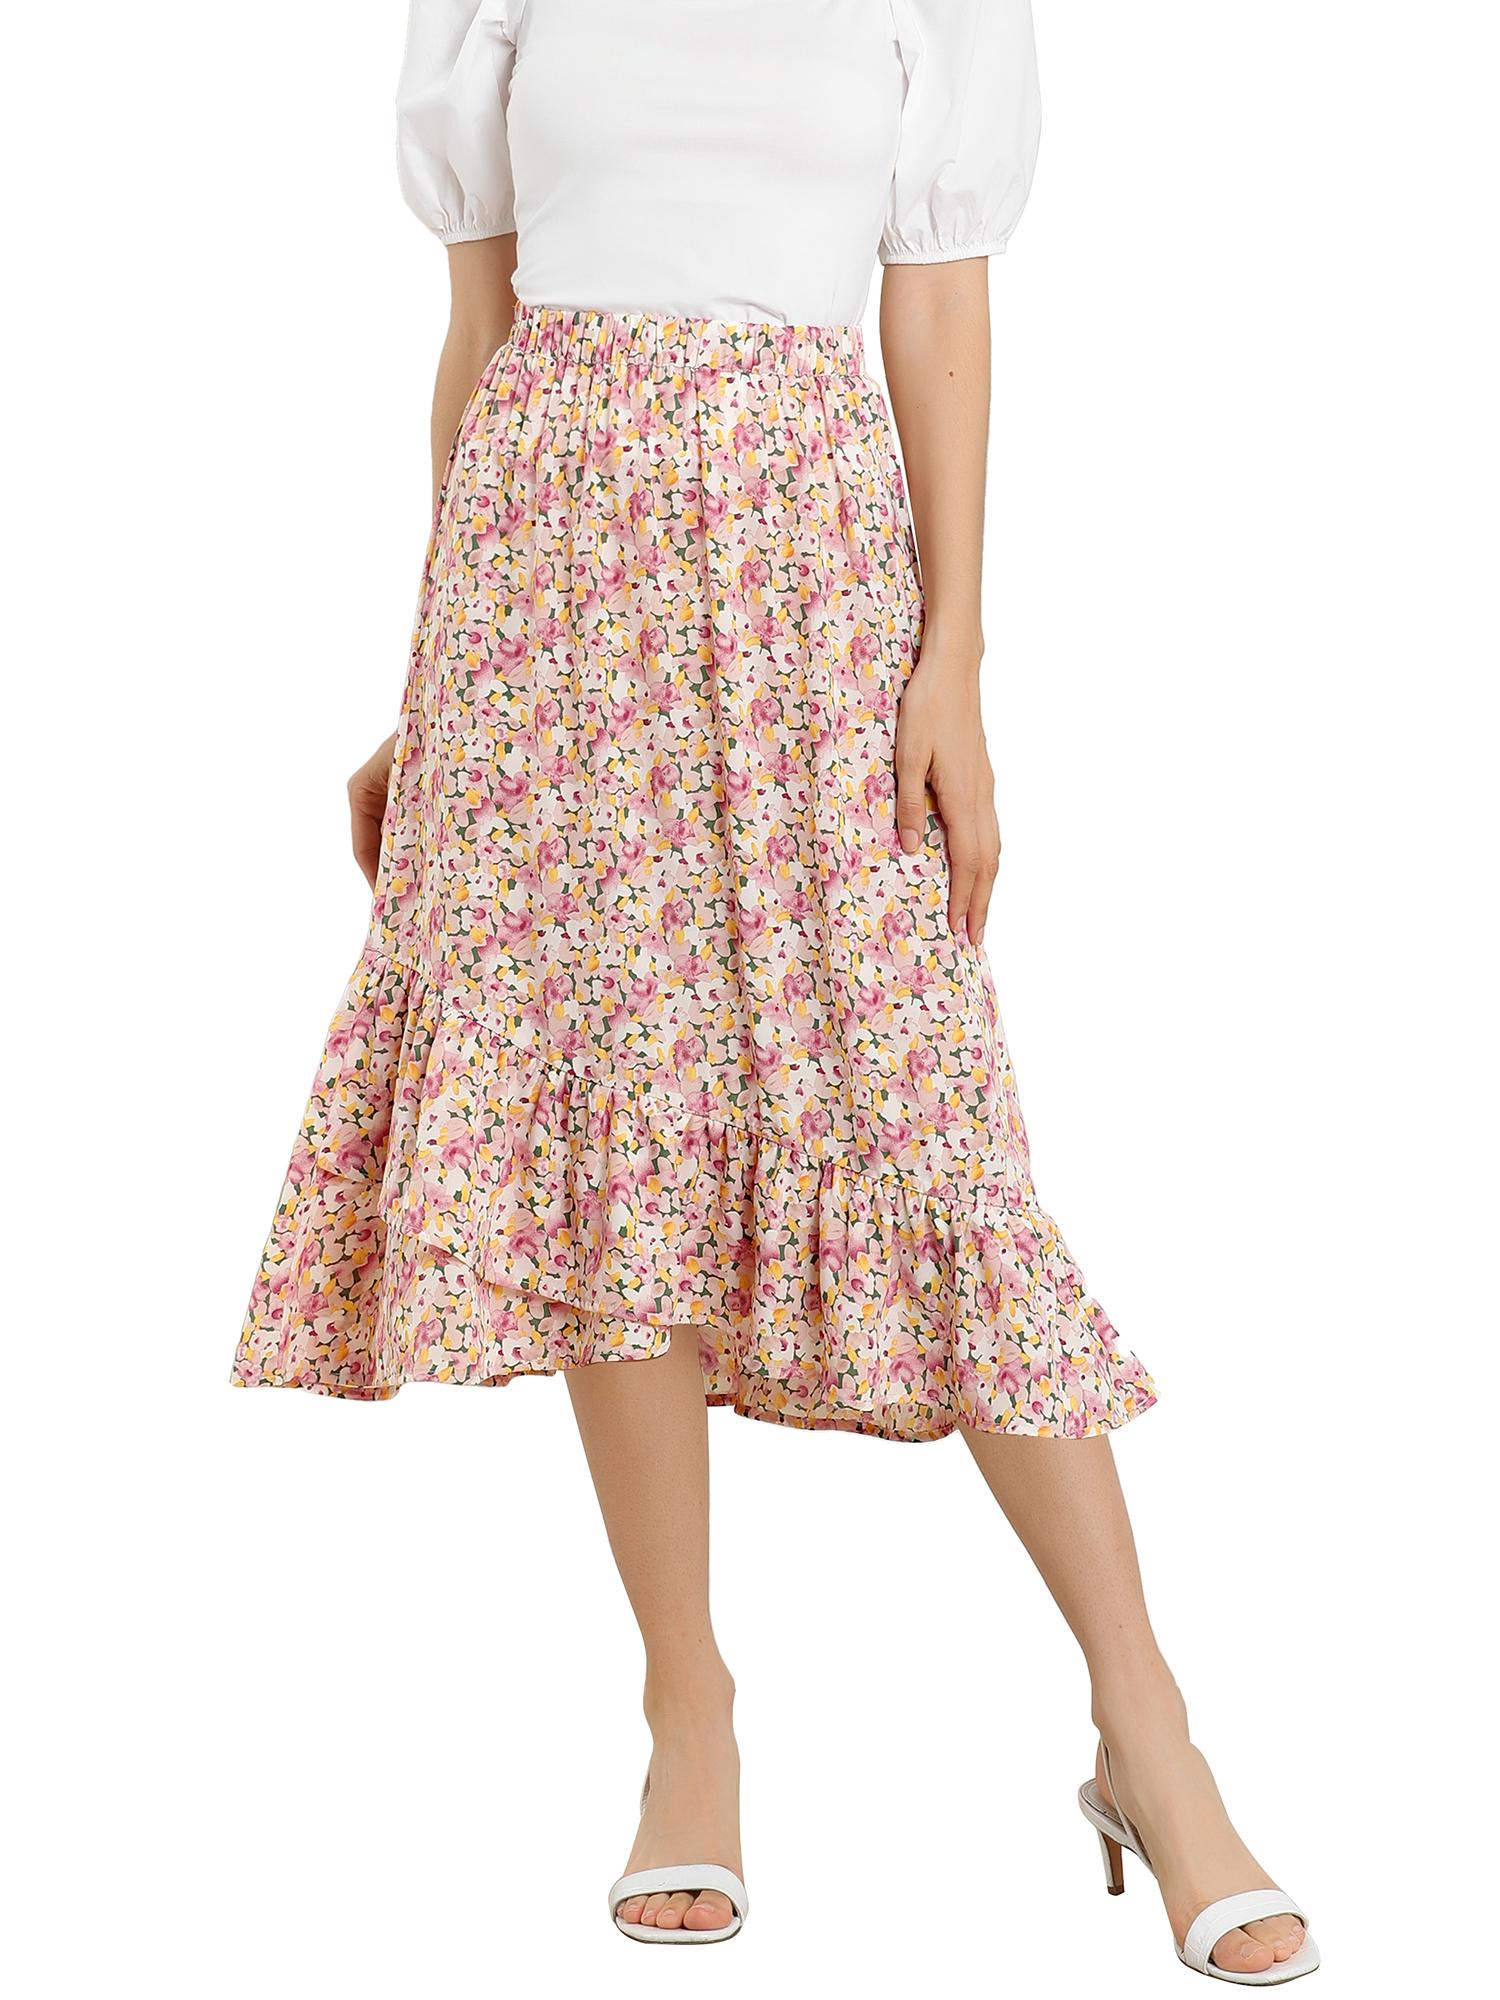 Women's Floral Fall Elastic Waist Ruffle High Low Hem Vintage Skirt Pink M